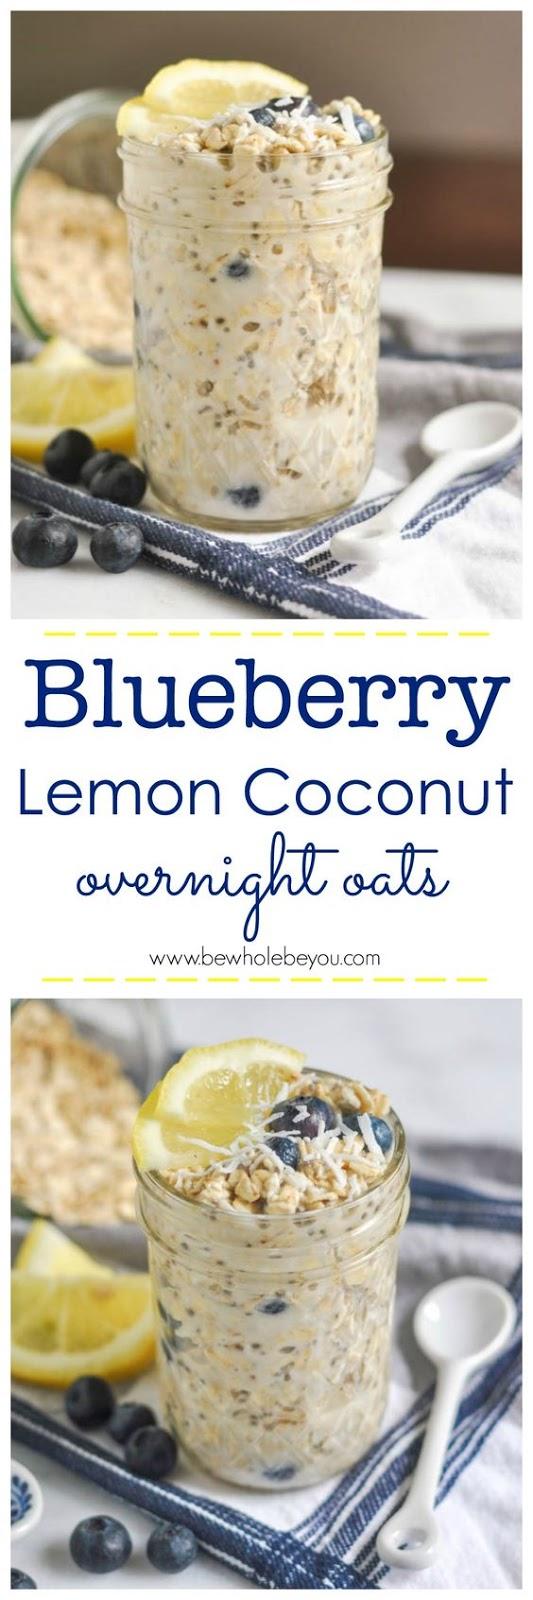 Blueberry Lemon Coconut Overnight Oats